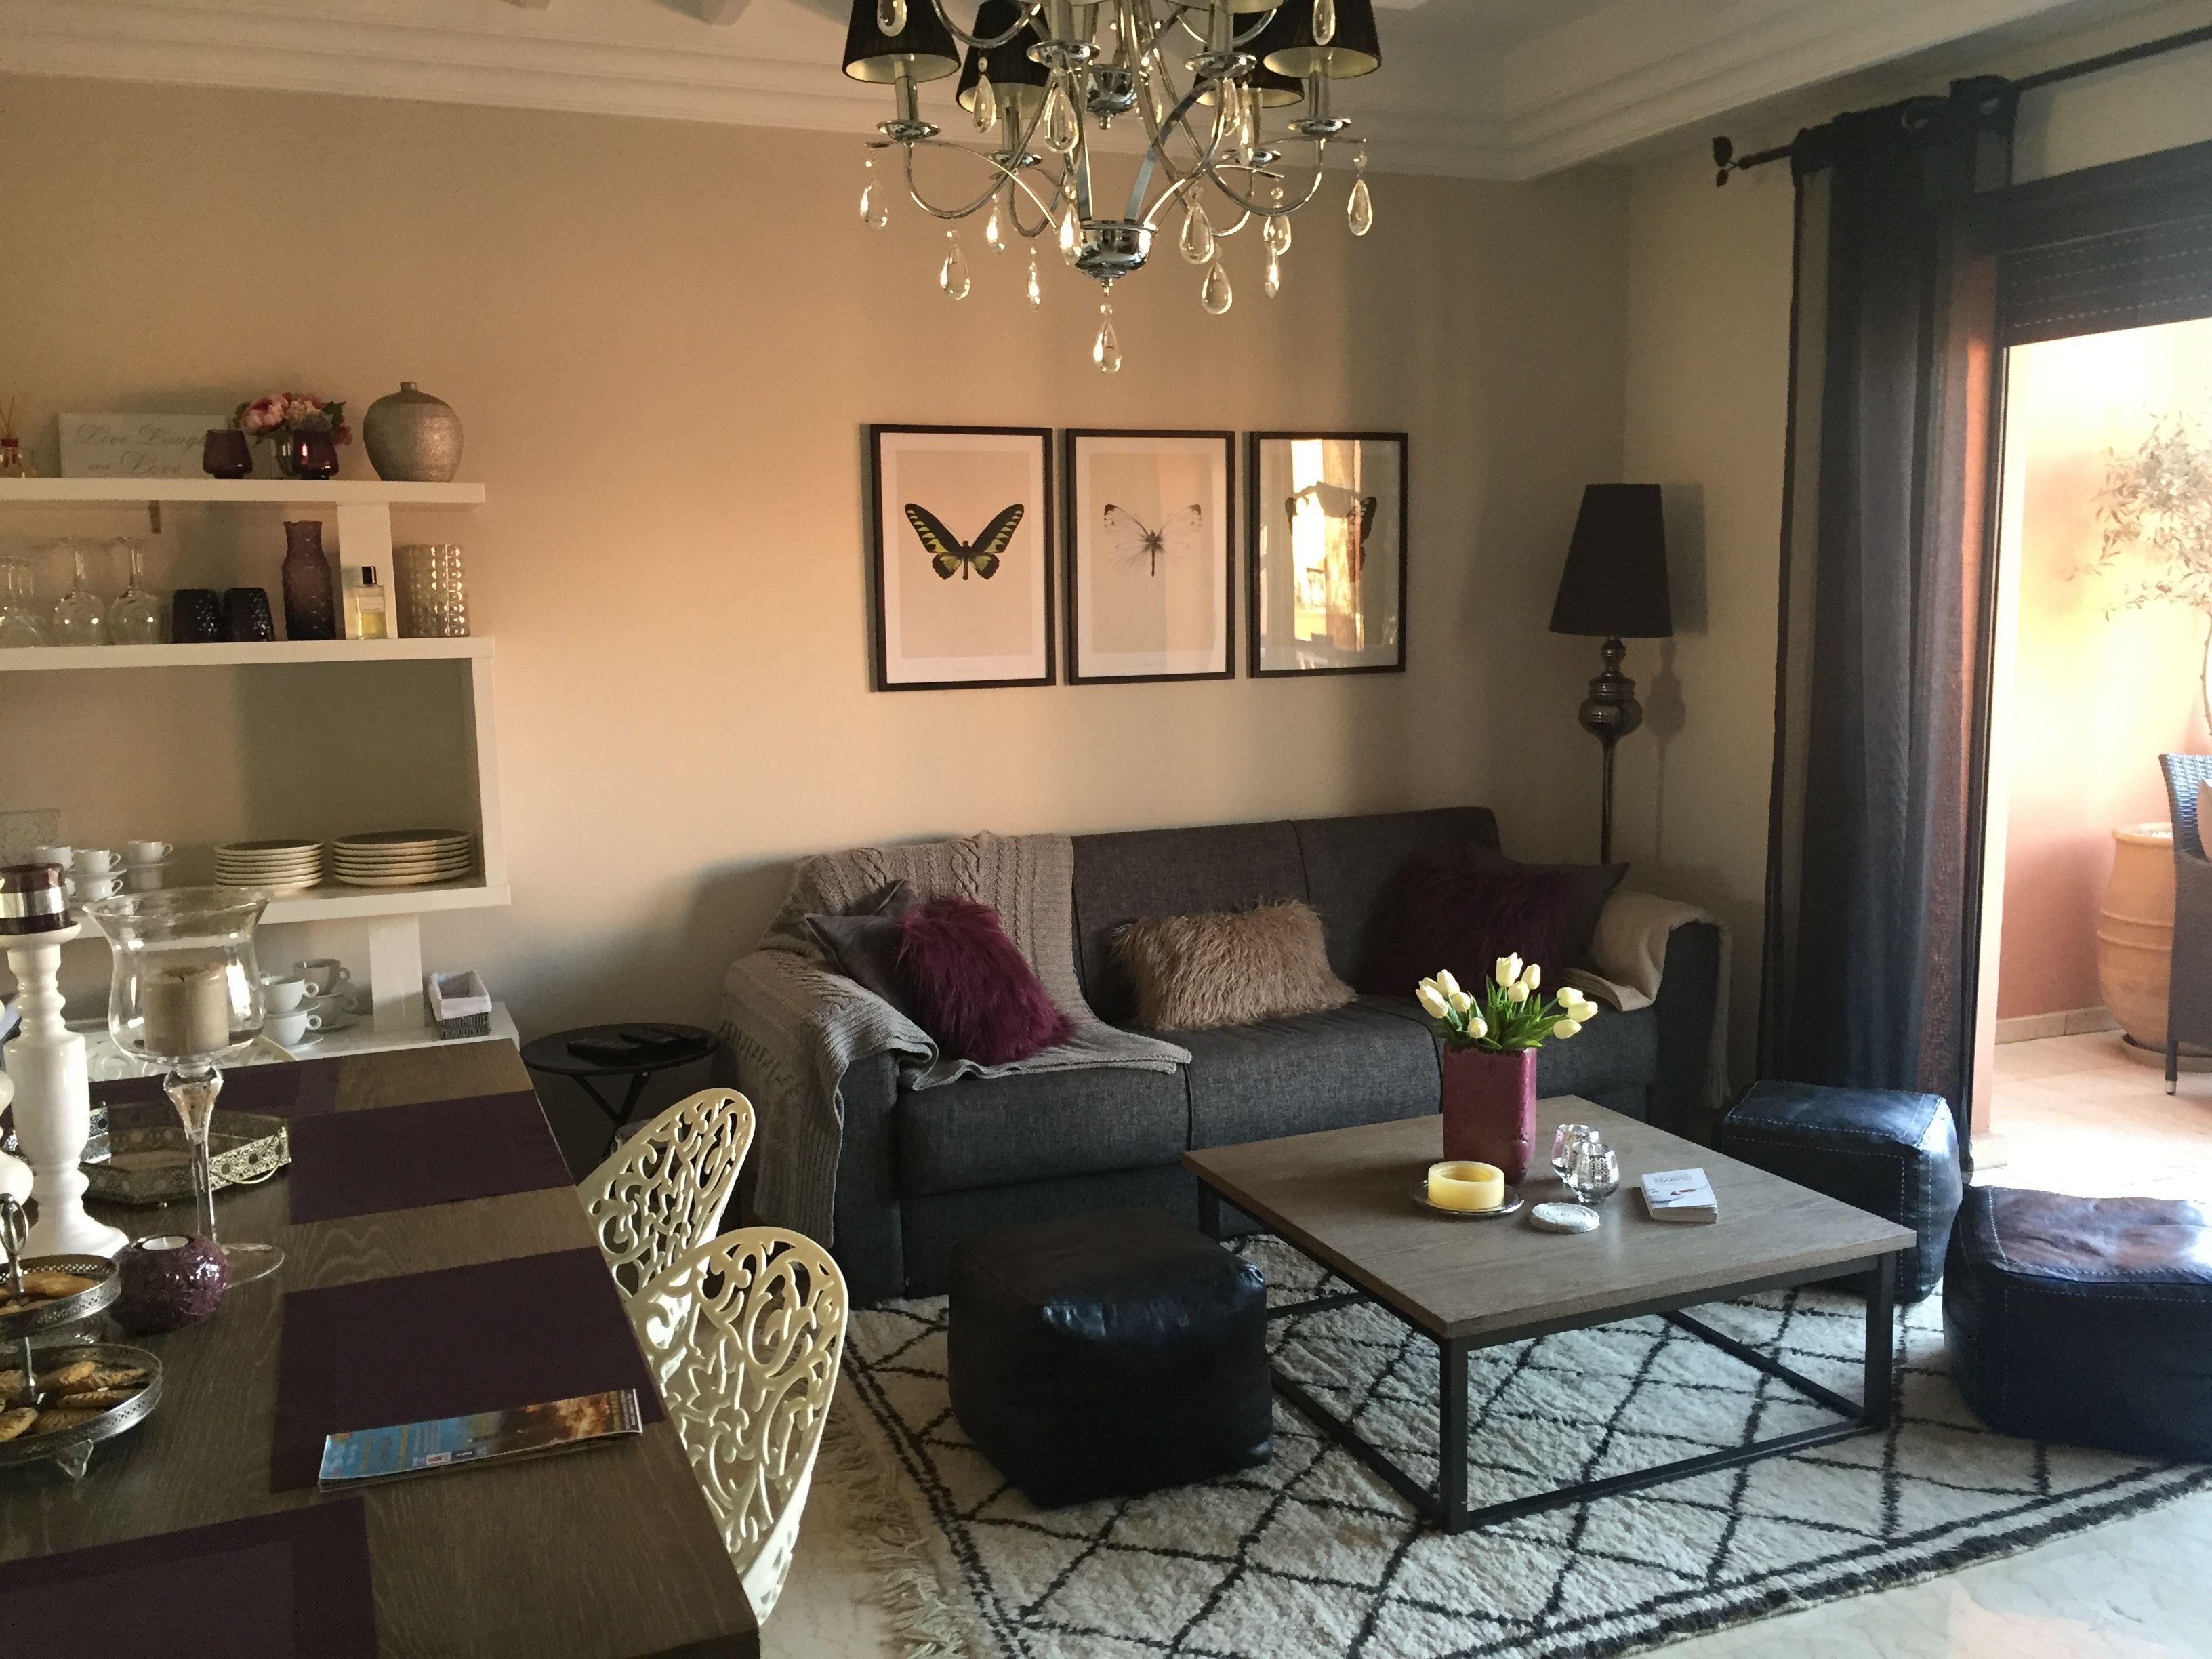 Salon chic tableau papillon gris et prune tapis bniwarine pouf en ...